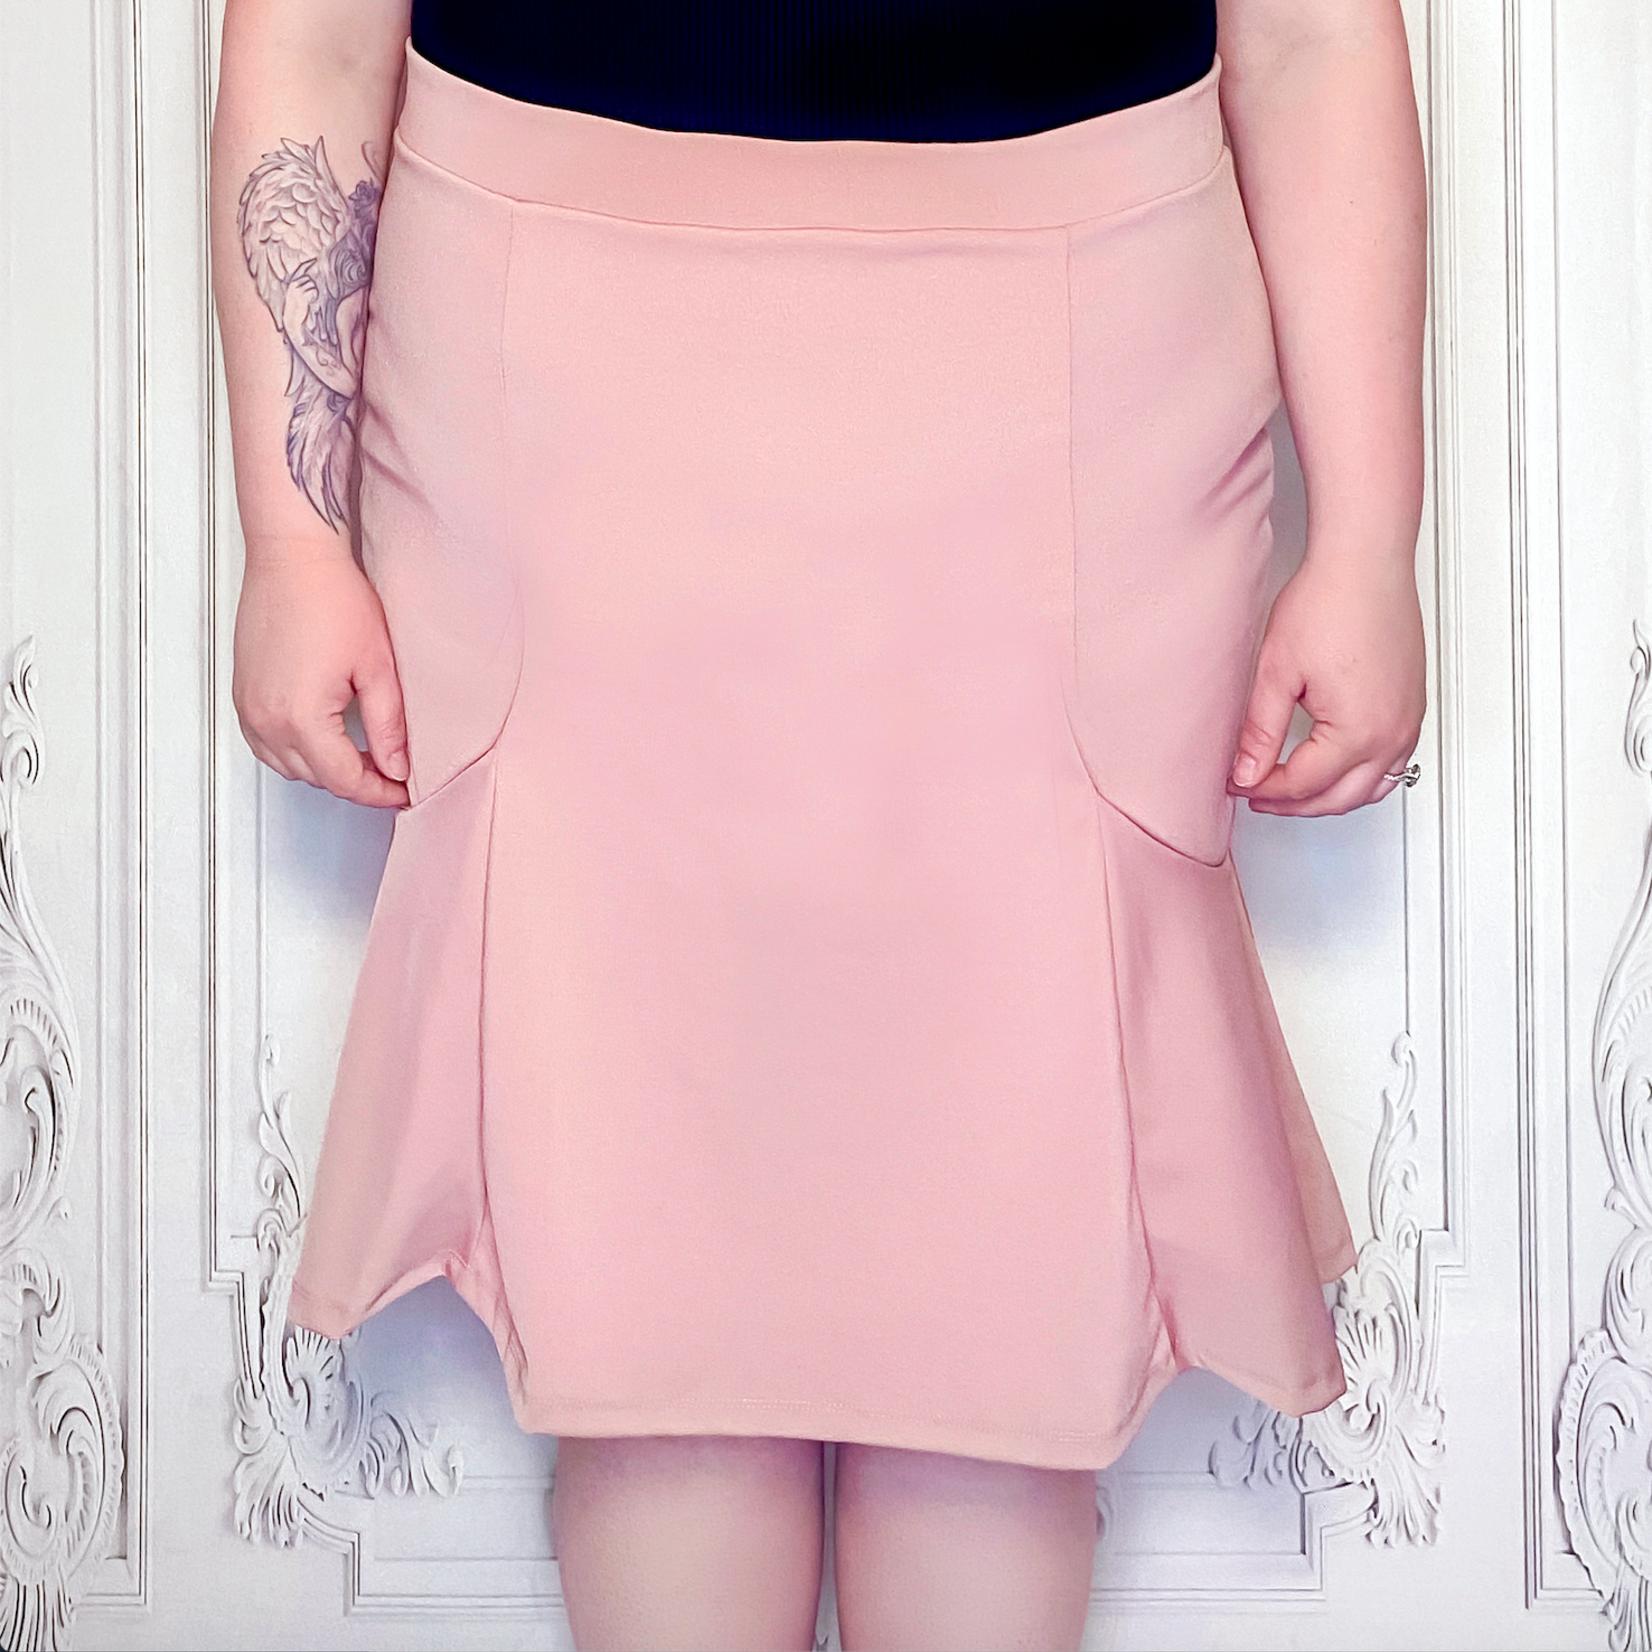 curvy mermaid skirt